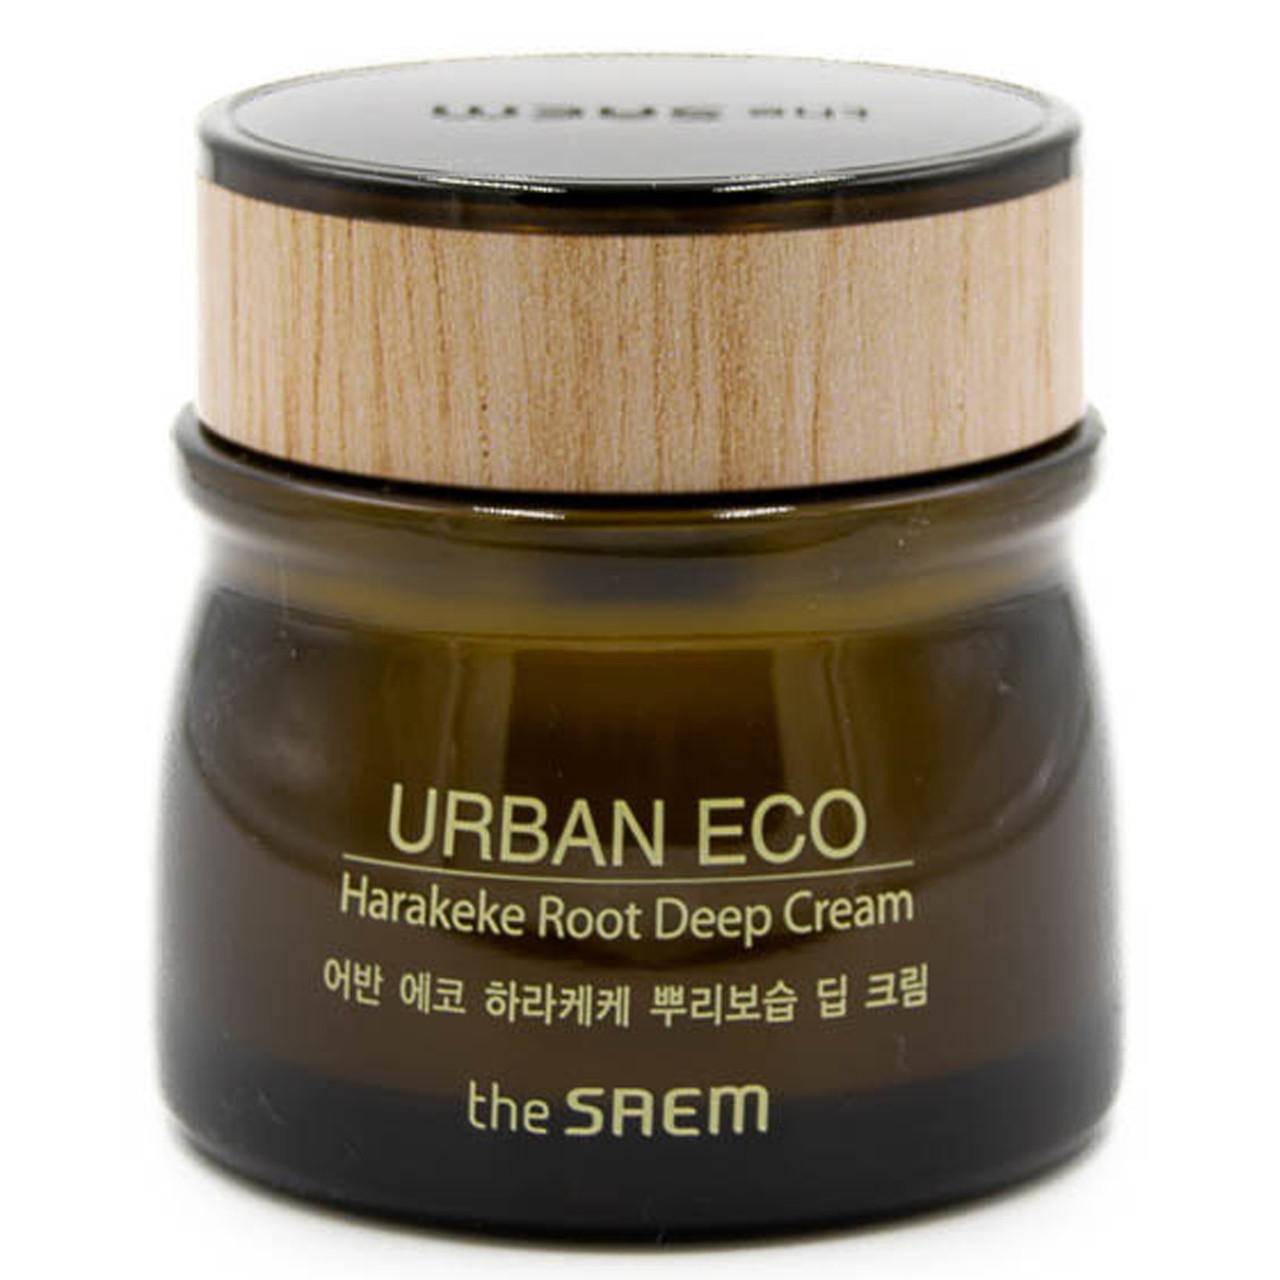 Увлажняющий крем для лица The Saem Urban Eco Harakeke Root Deep Cream 60 мл (8806164150085)